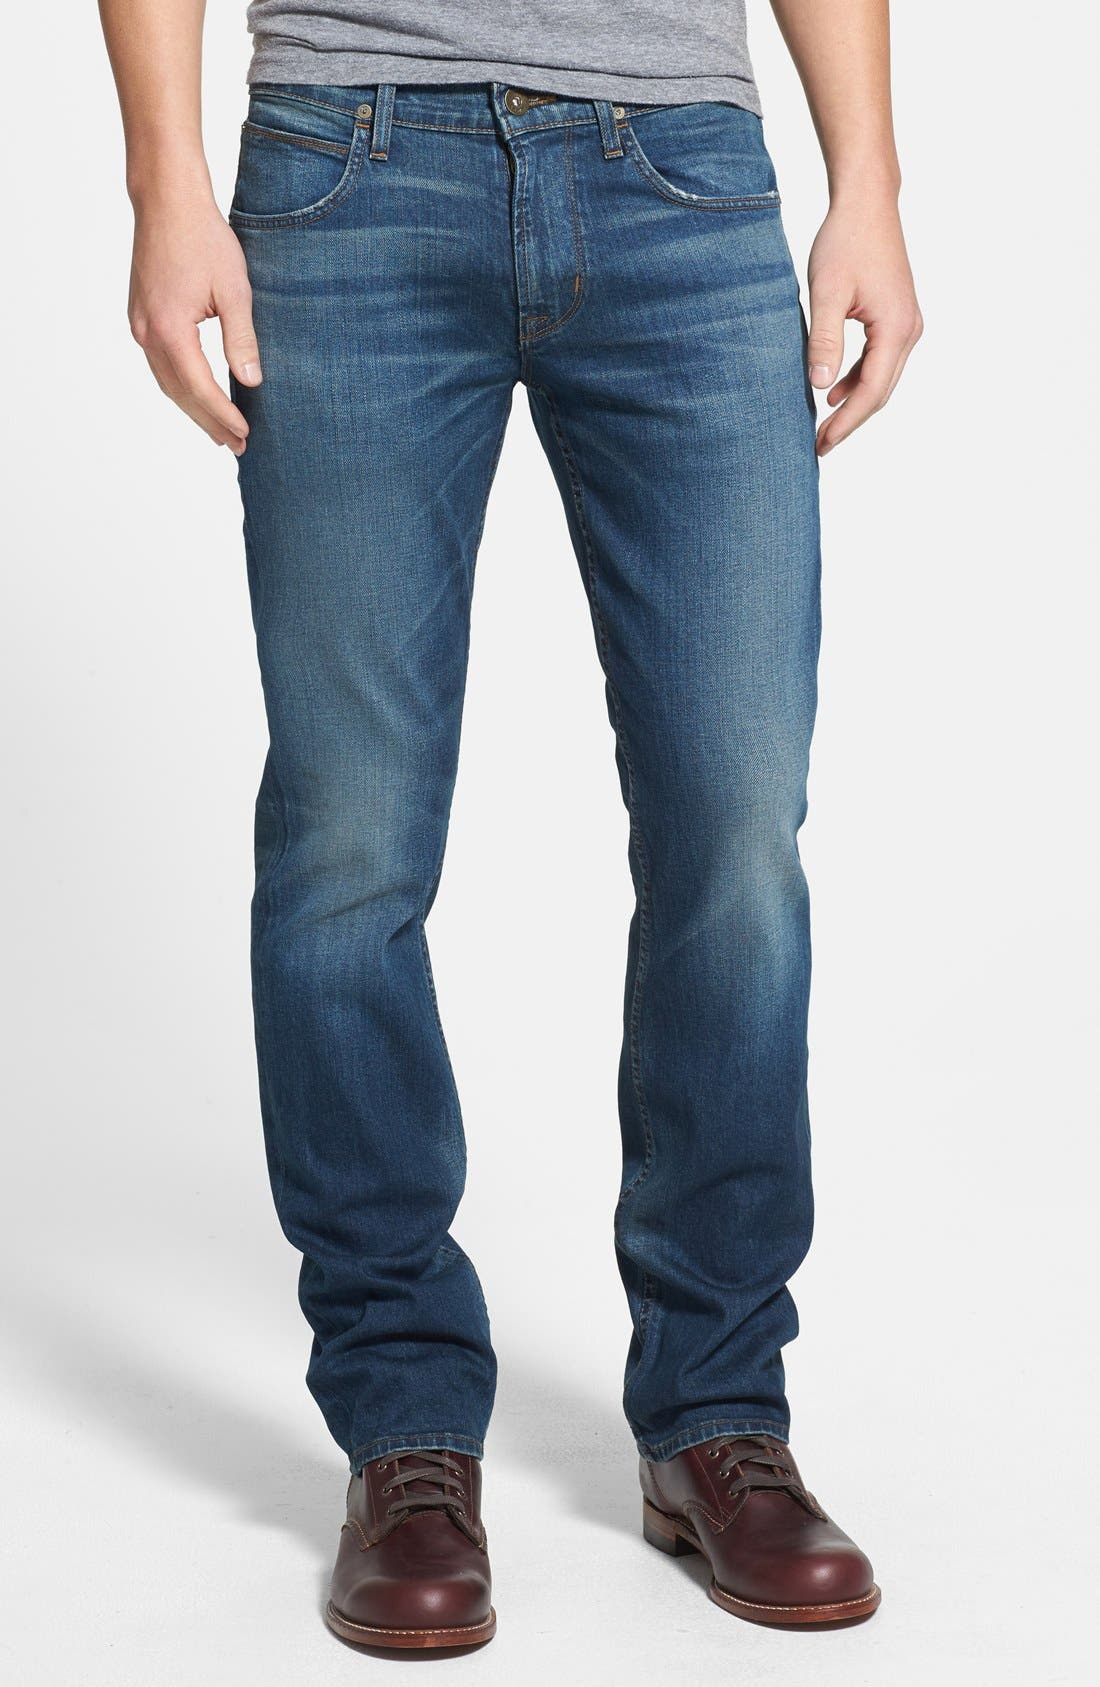 Alternate Image 1 Selected - Hudson Jeans 'Byron' Straight Leg Jeans (Boneyard)